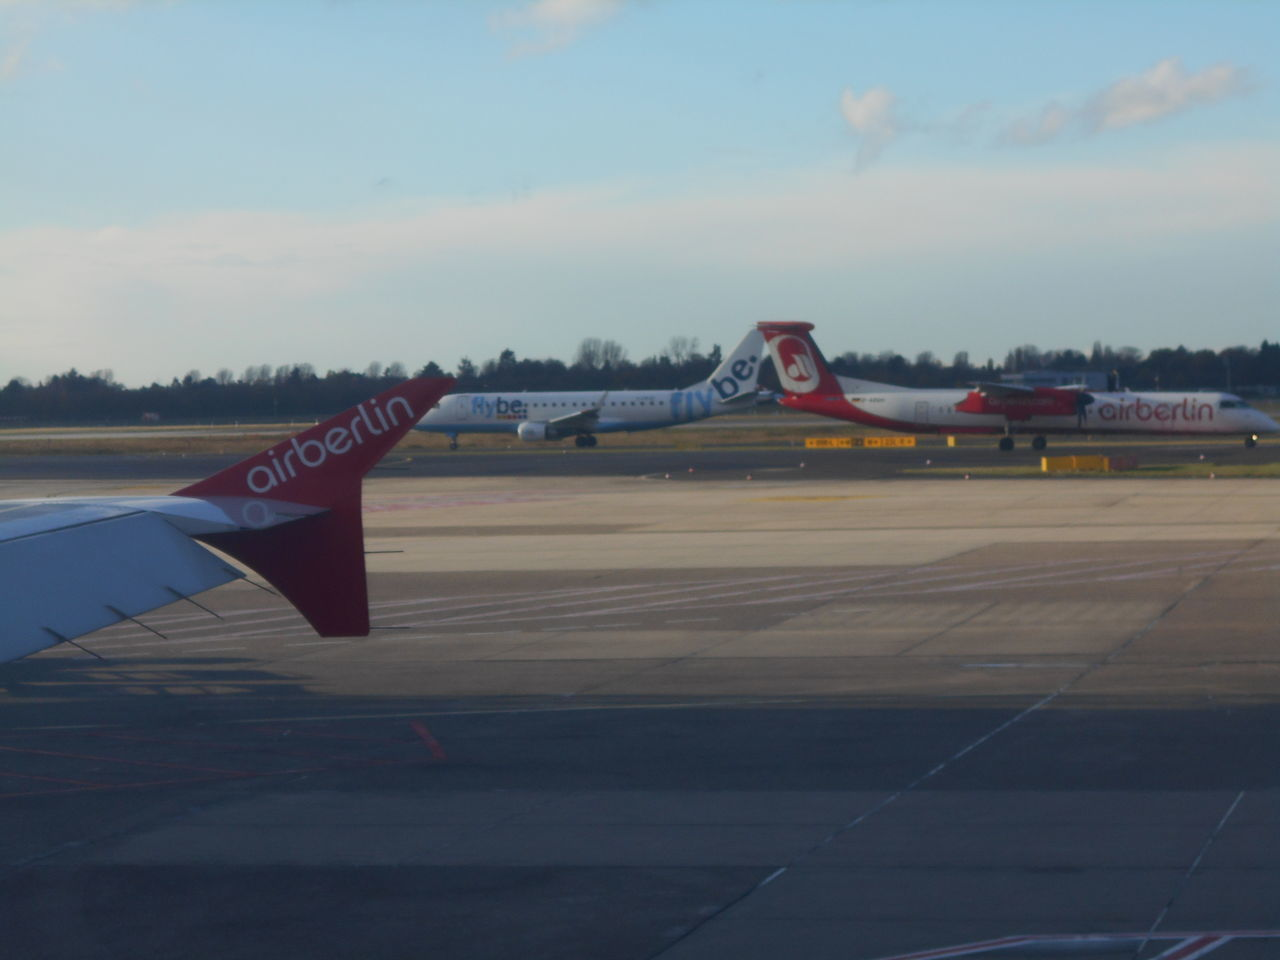 airplane, air vehicle, transportation, sky, airport runway, no people, cloud - sky, day, runway, outdoors